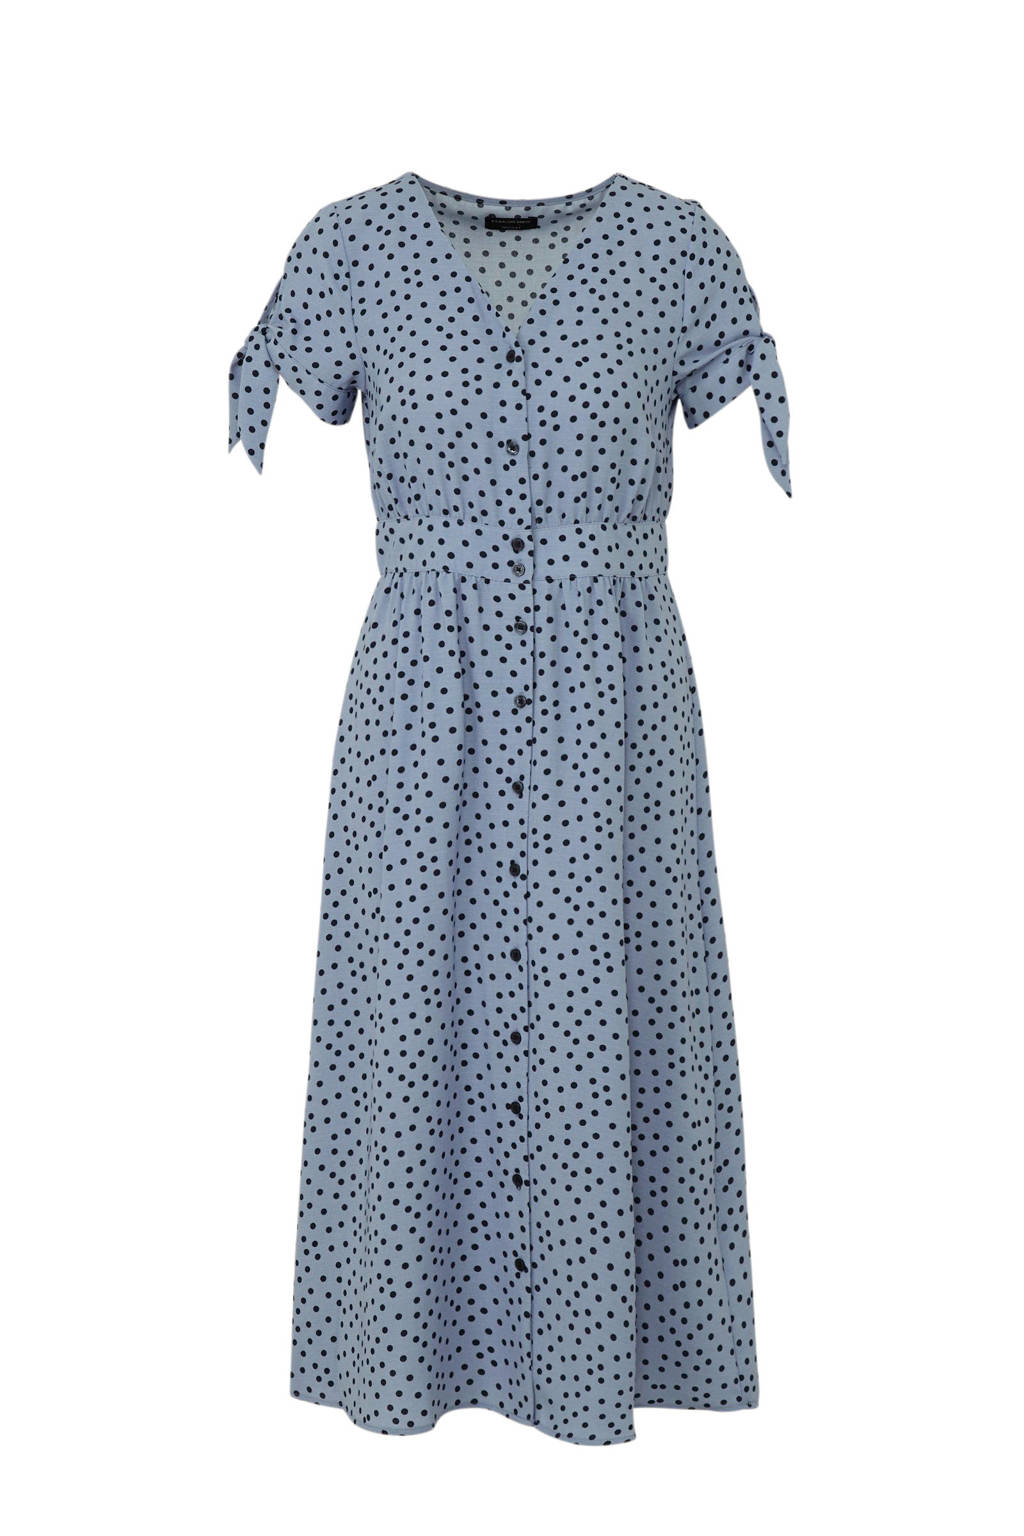 C&A Yessica jurk met stippen blauw, Blauw